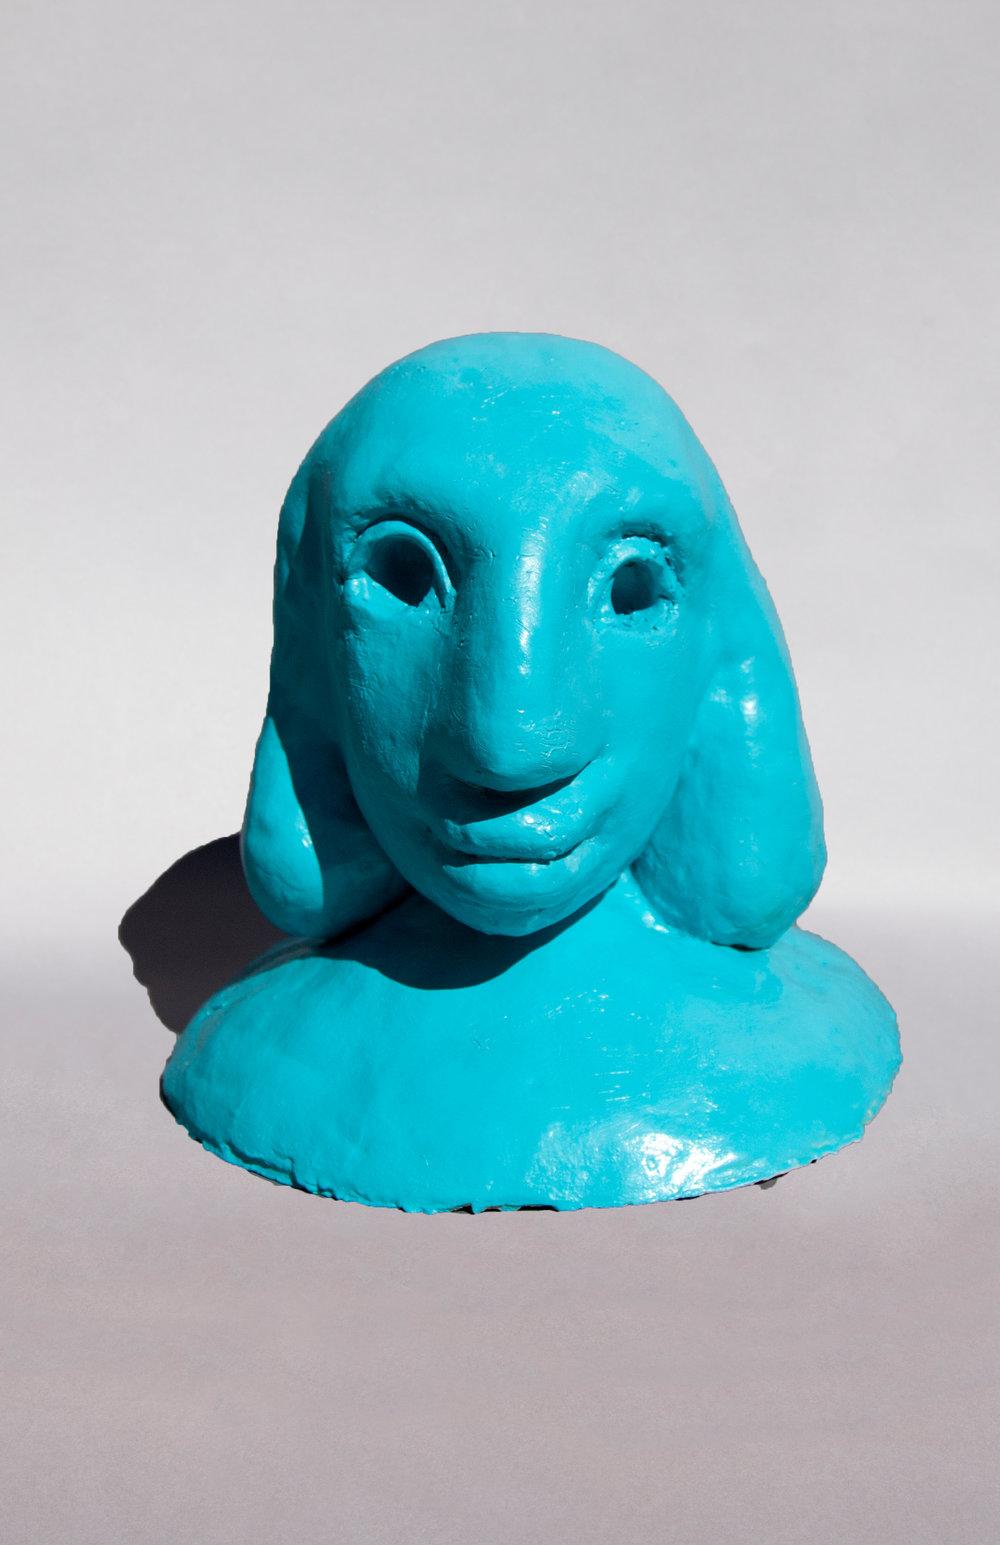 Blue Figure, Painted Ceramic, 14HX14WX14D